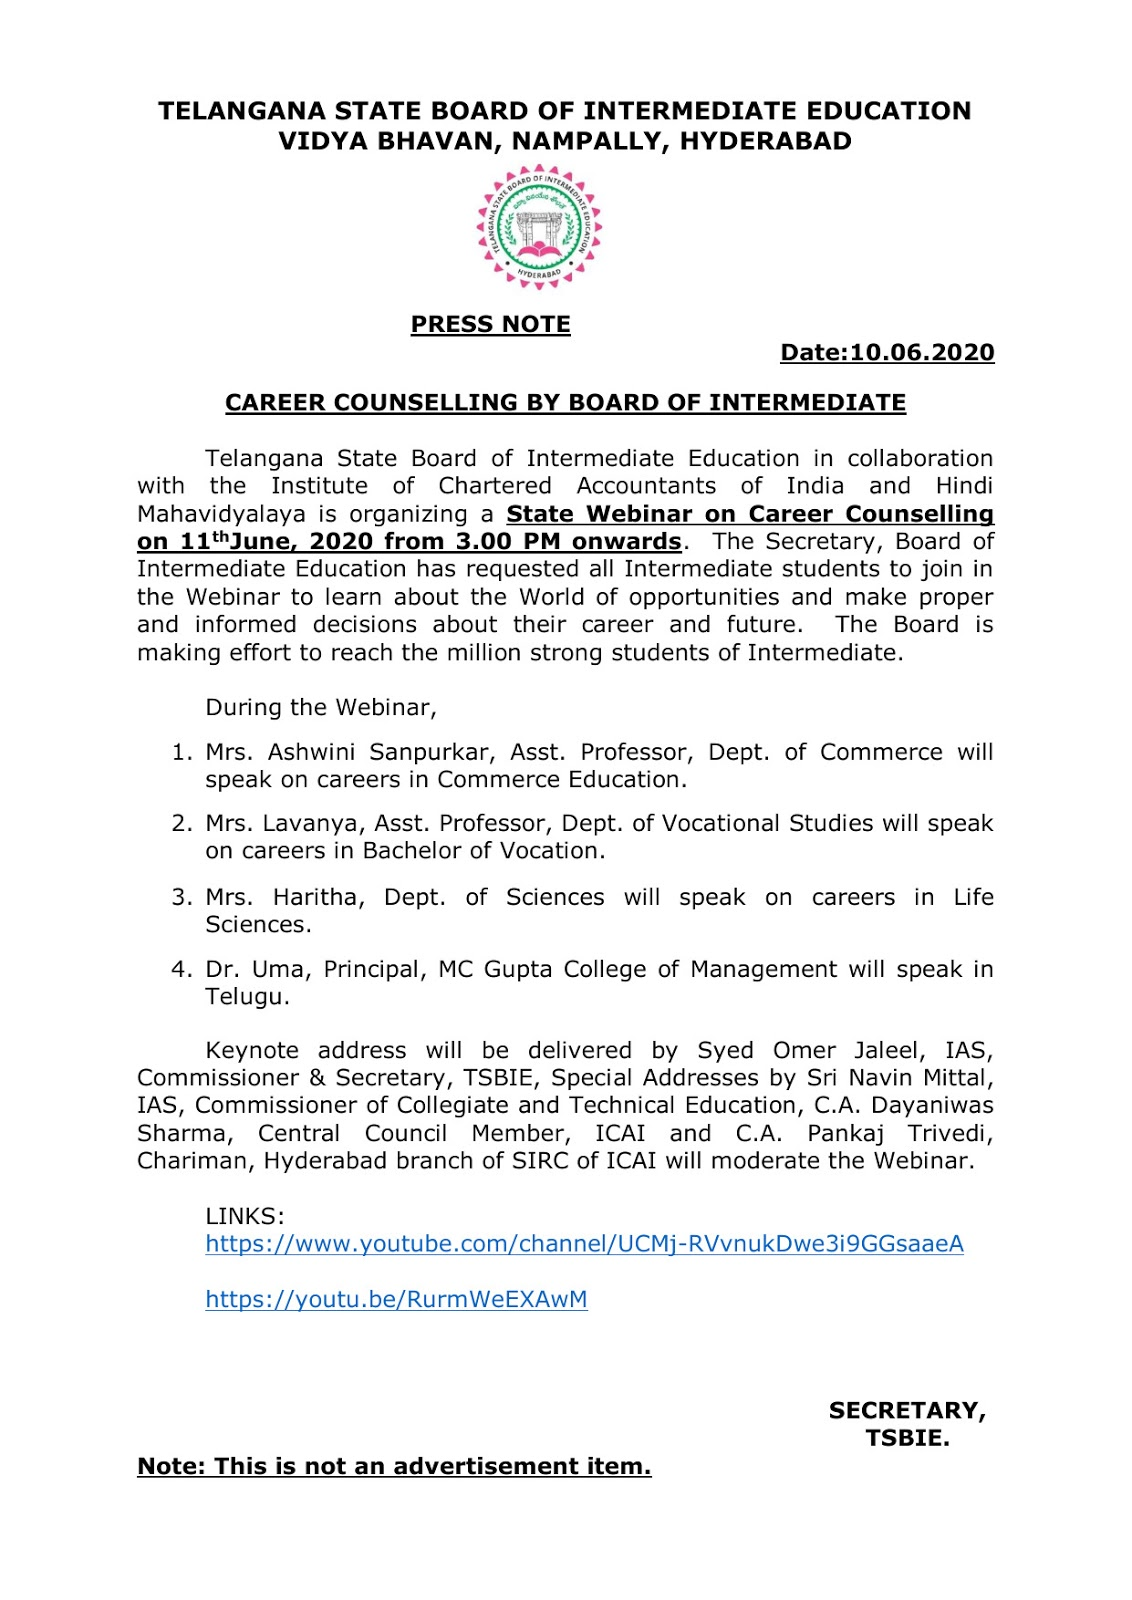 telangana board inter education inter 2020 career counselling notification